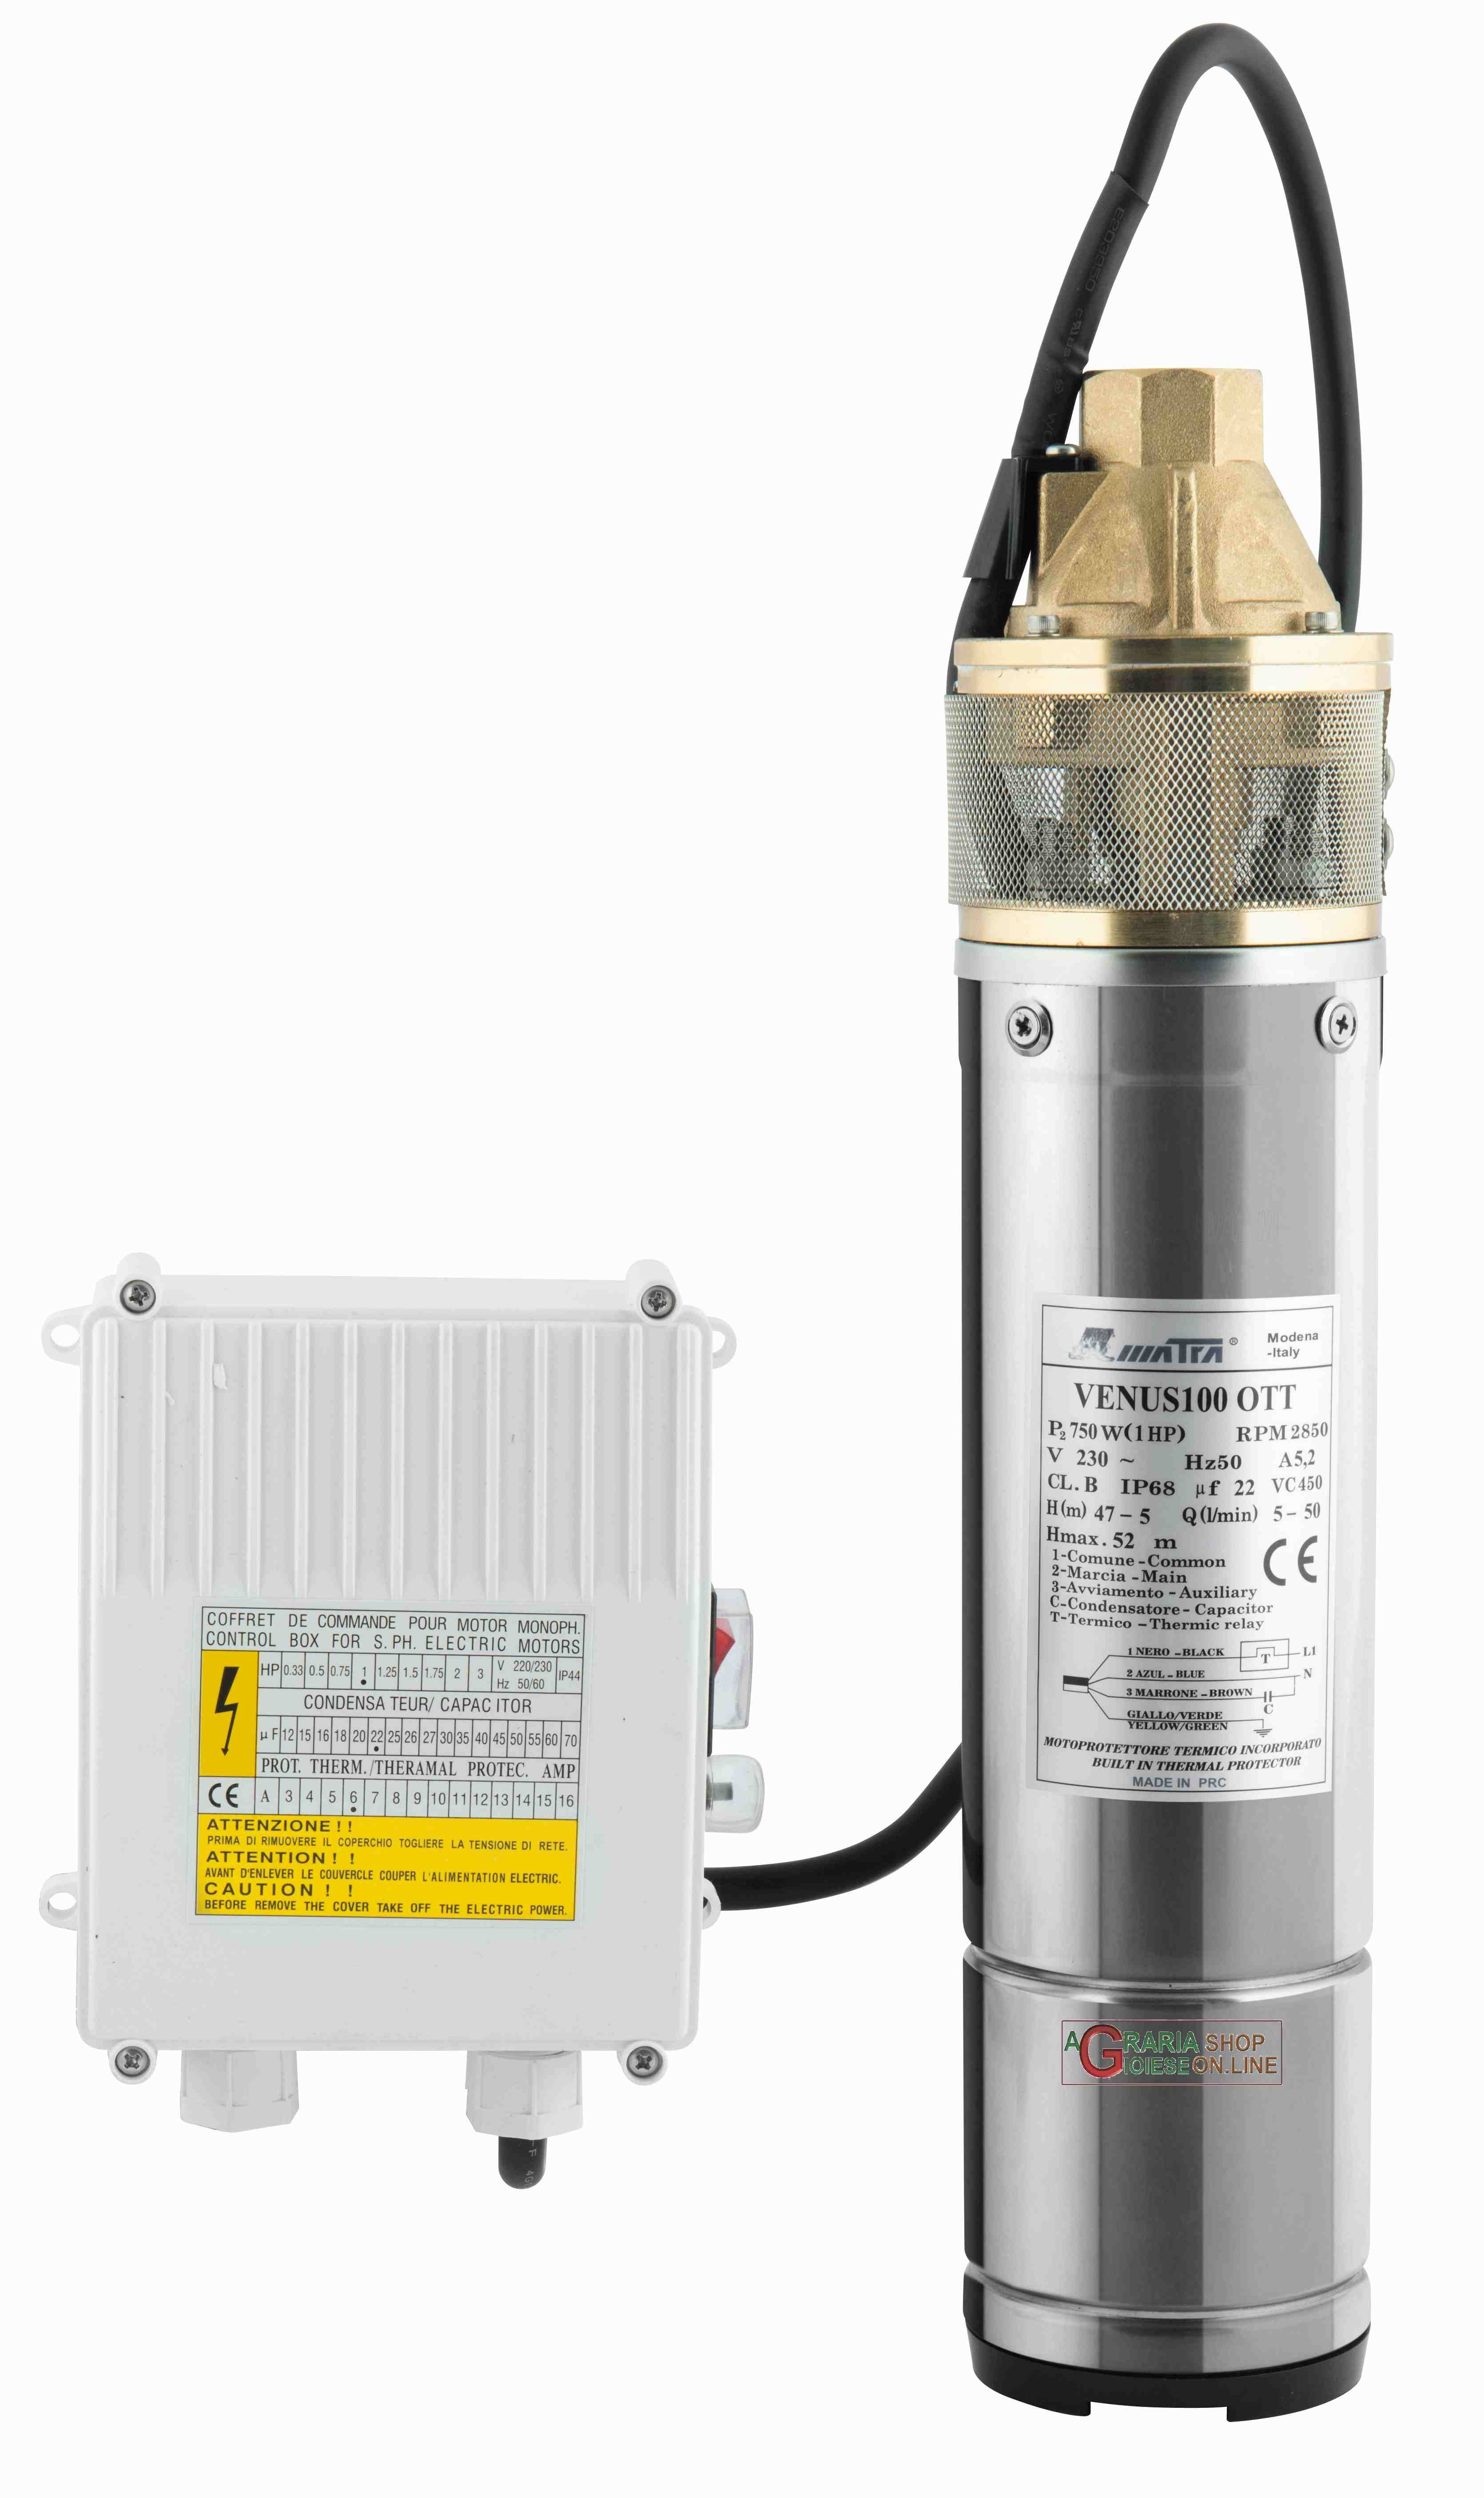 Submersible Pump Hp 10 Mod Tm10 Drainage Karcher Sp 3 Dirt Electric Pumps 4921 19900 In Stock